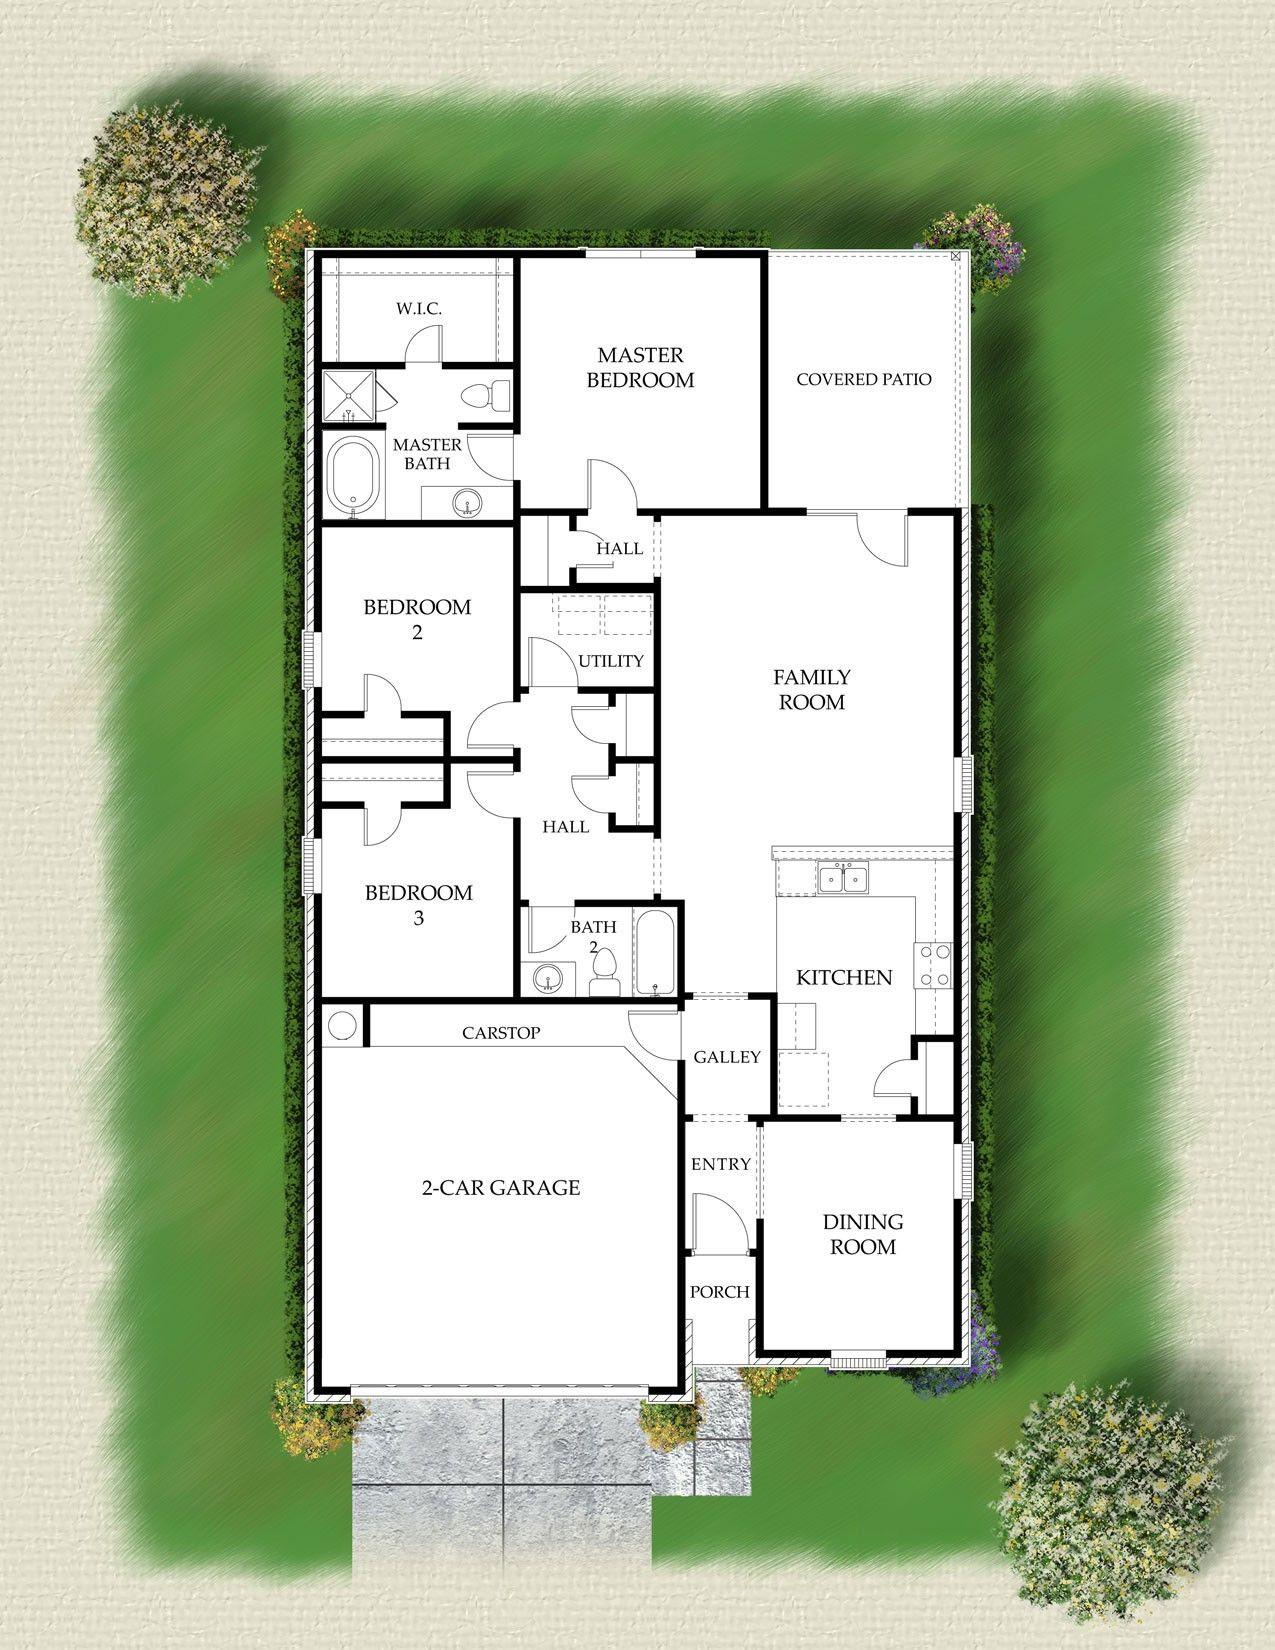 19 Lgi Homes Floor Plans Du2a